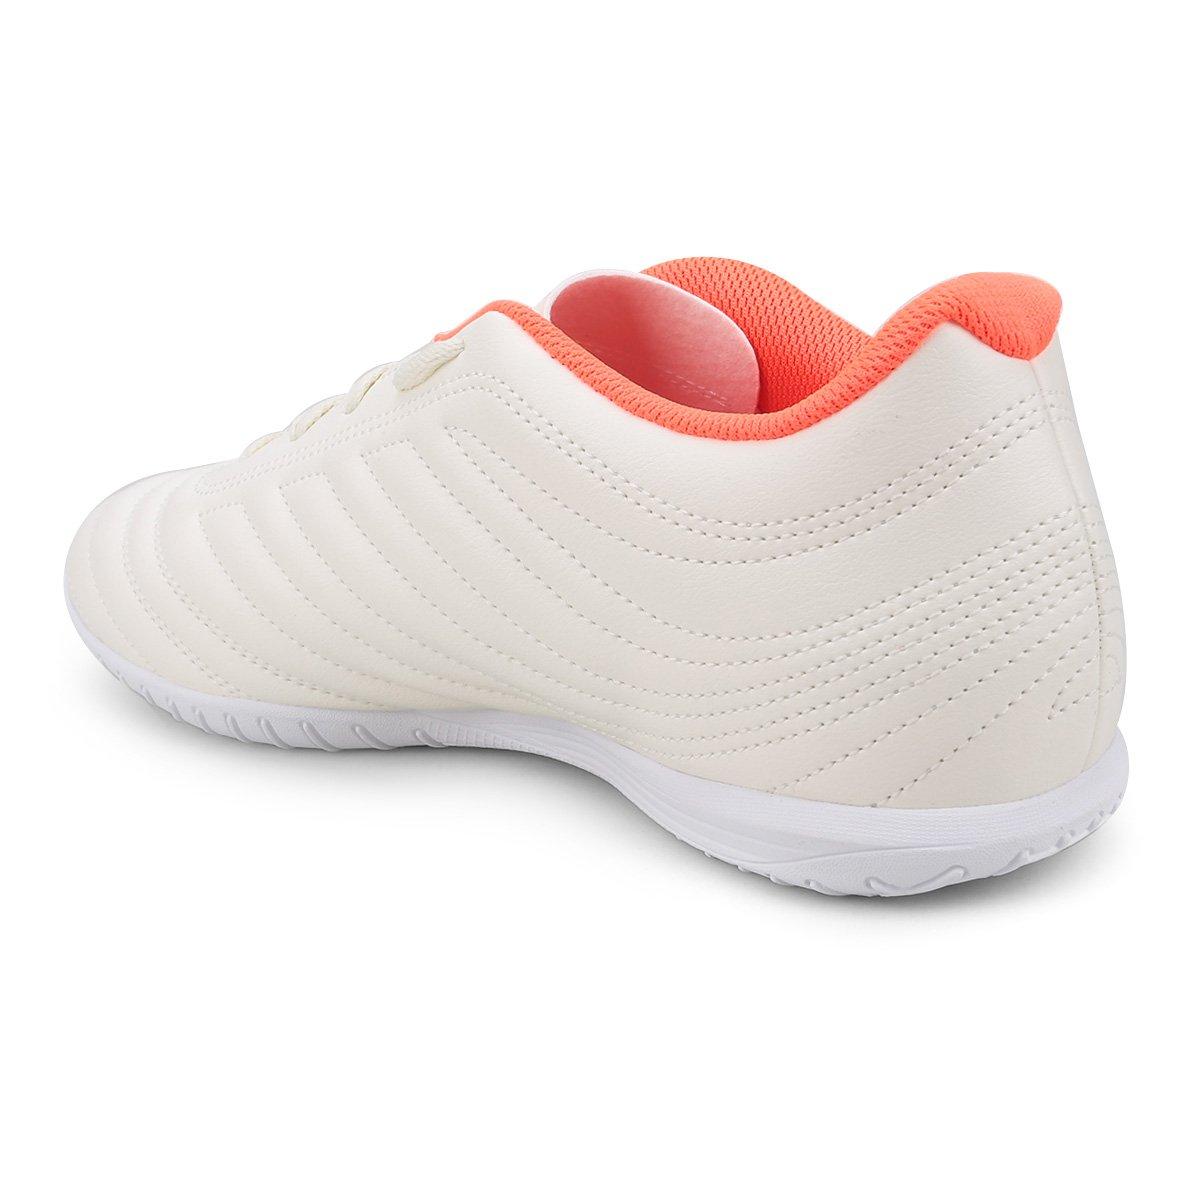 Chuteira Futsal Adidas Copa 19 4 IN - Branco e Vermelho - Compre ... 58367ee77cc76